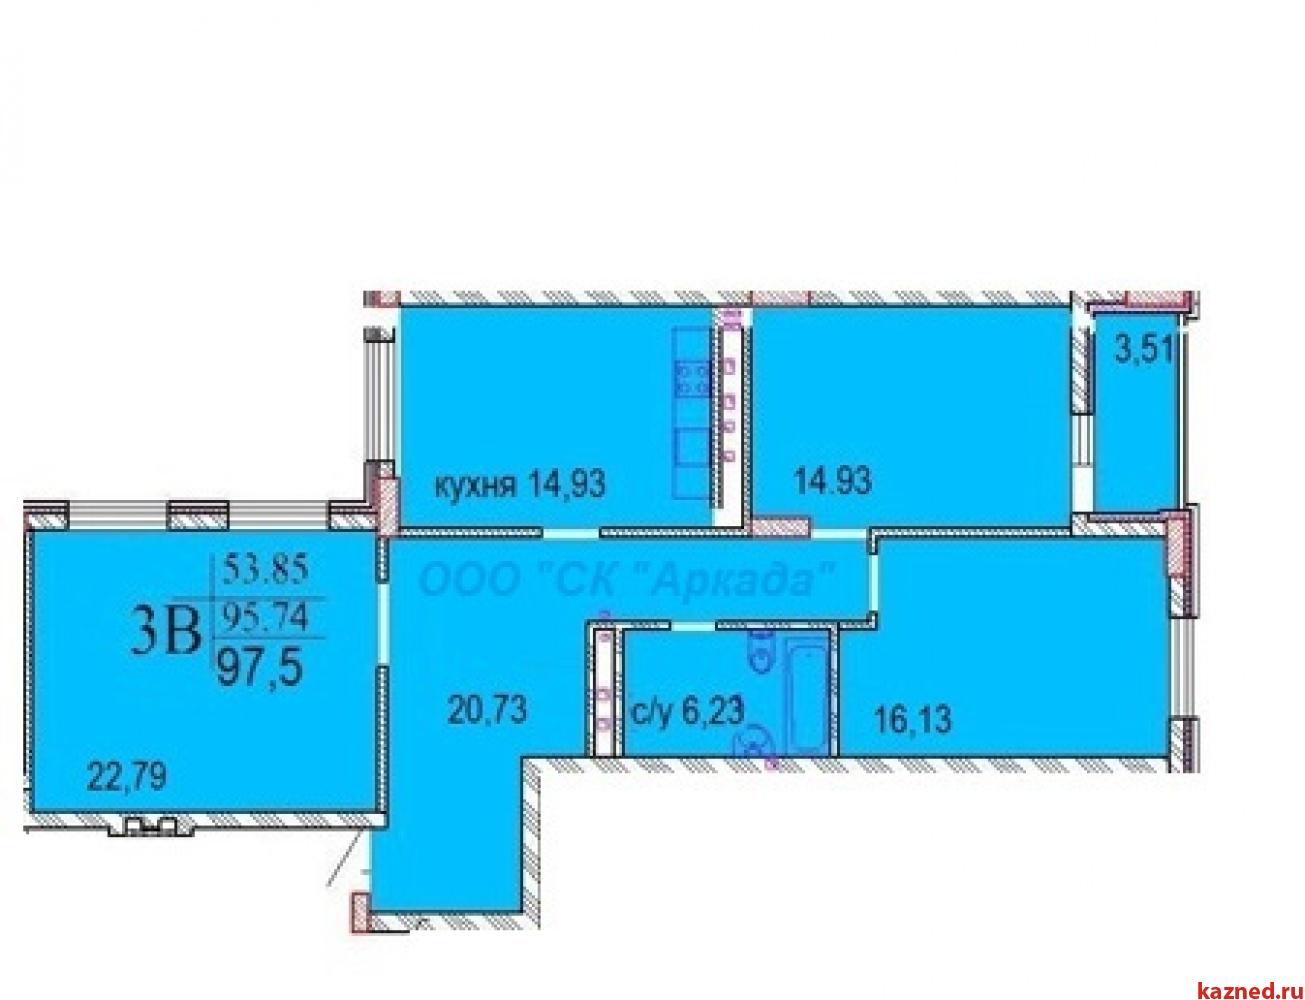 Продажа 3-к квартиры Шуртыгина, д.7, 98 м² (миниатюра №2)